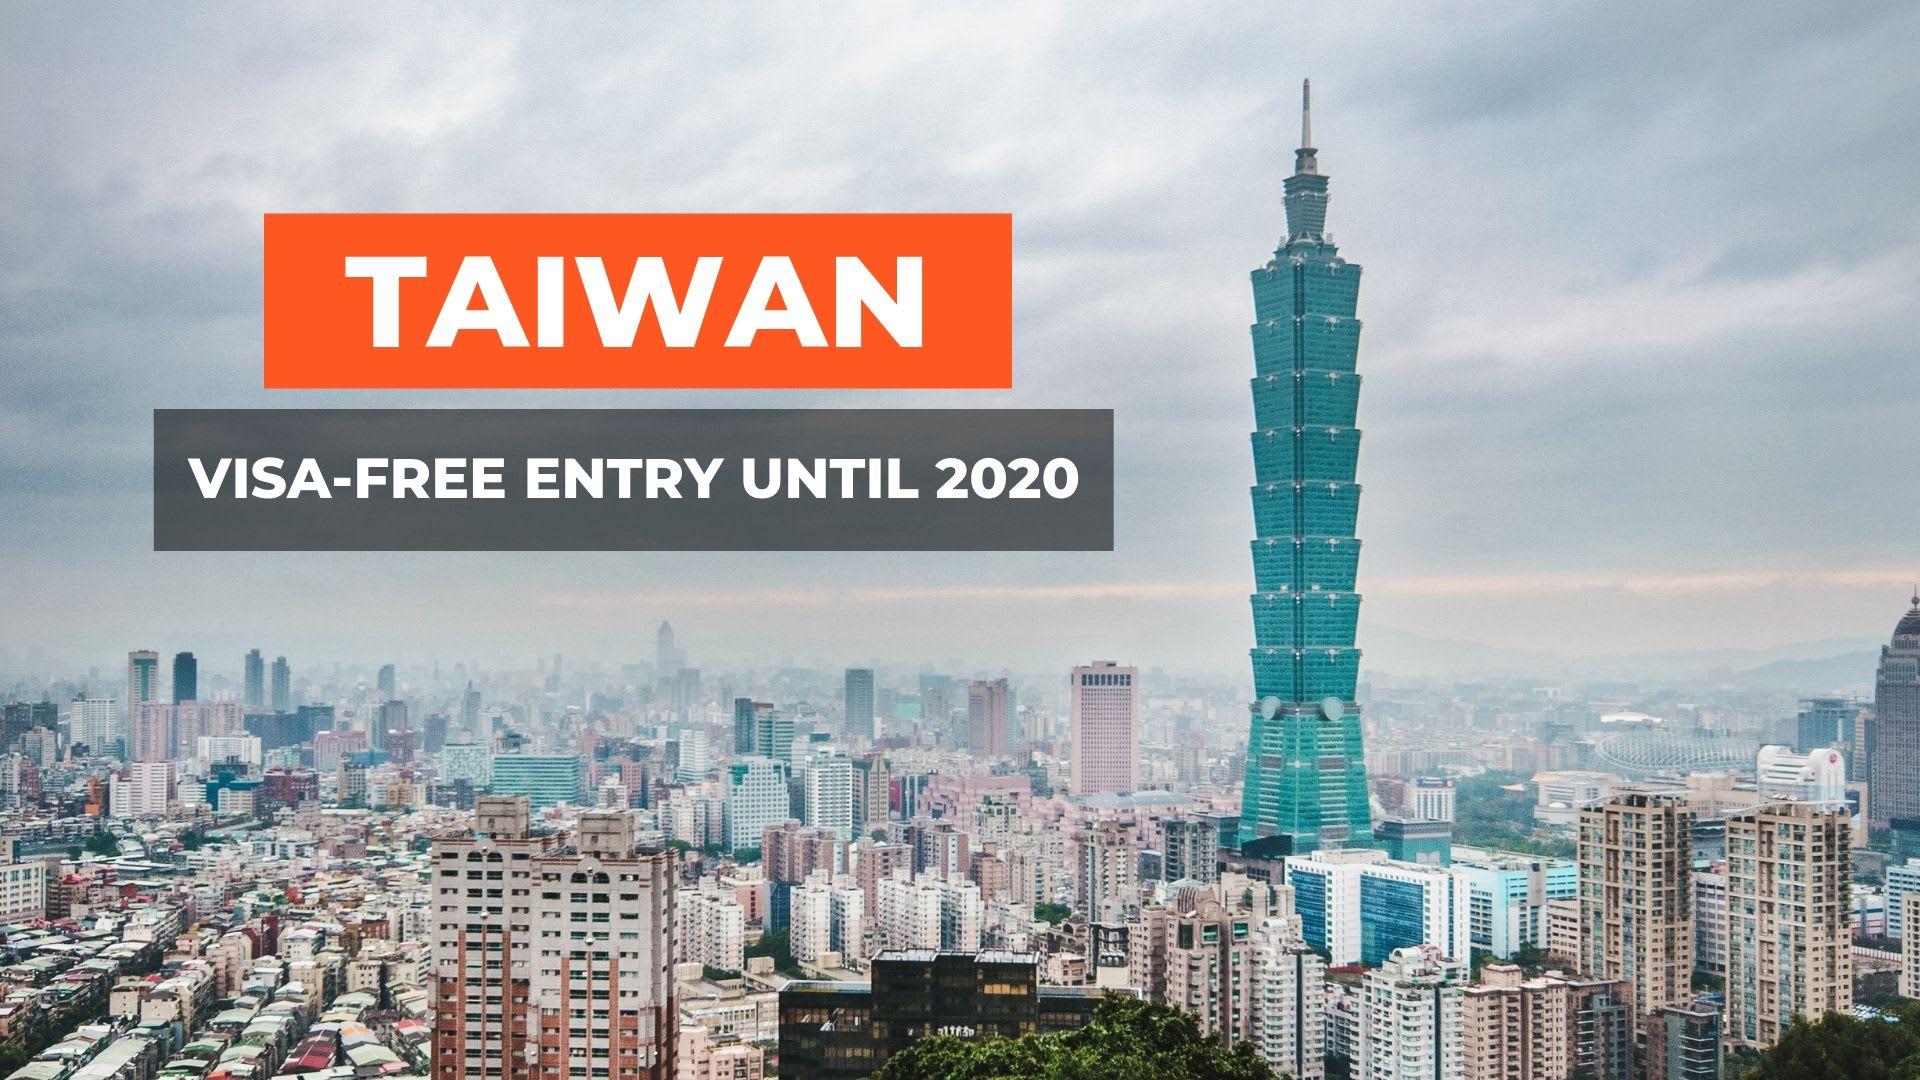 TAIWAN VISA FREE 2020